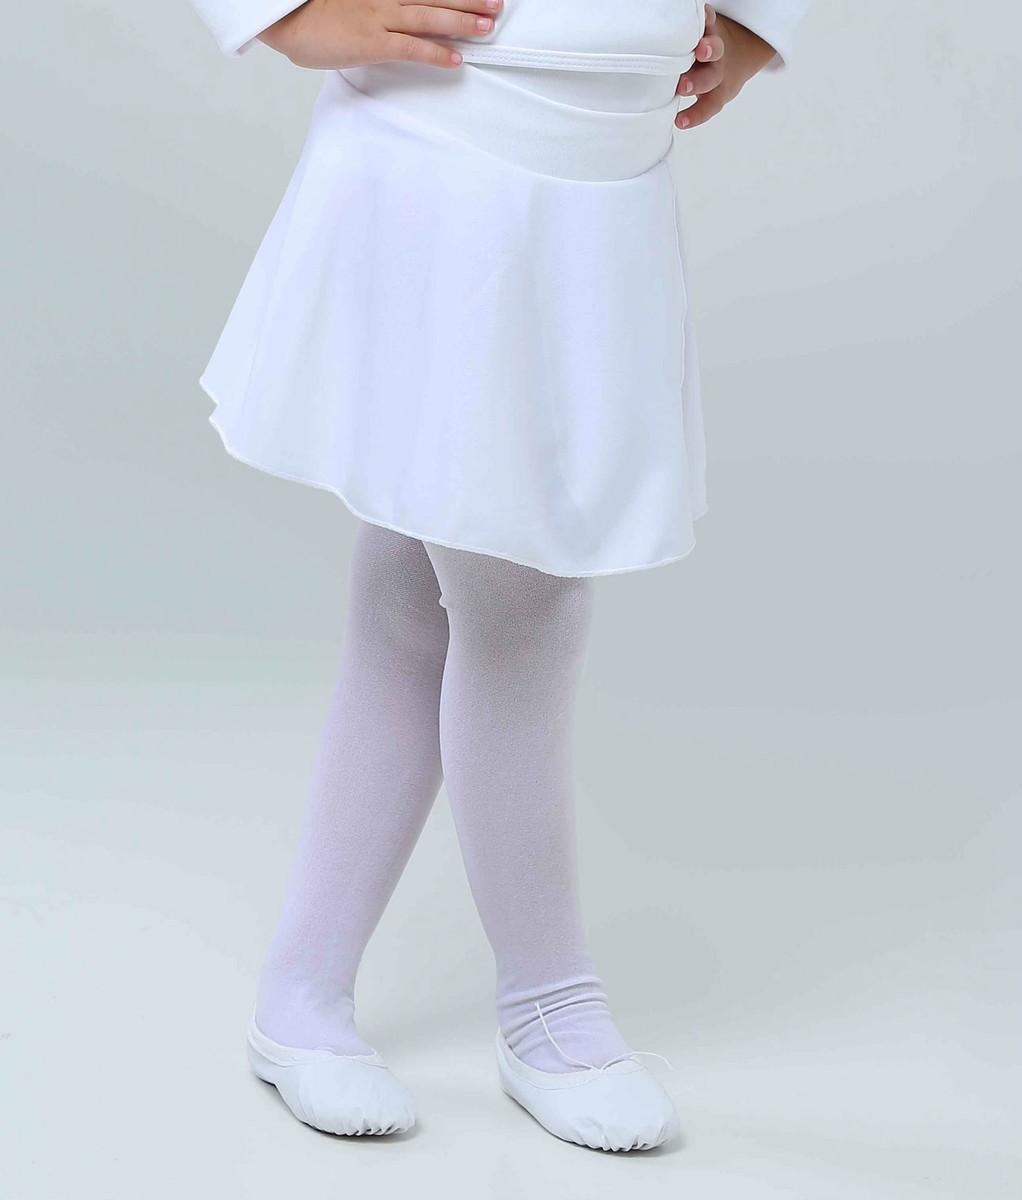 d0520811f Saia Ballet Infantil Branca no Elo7